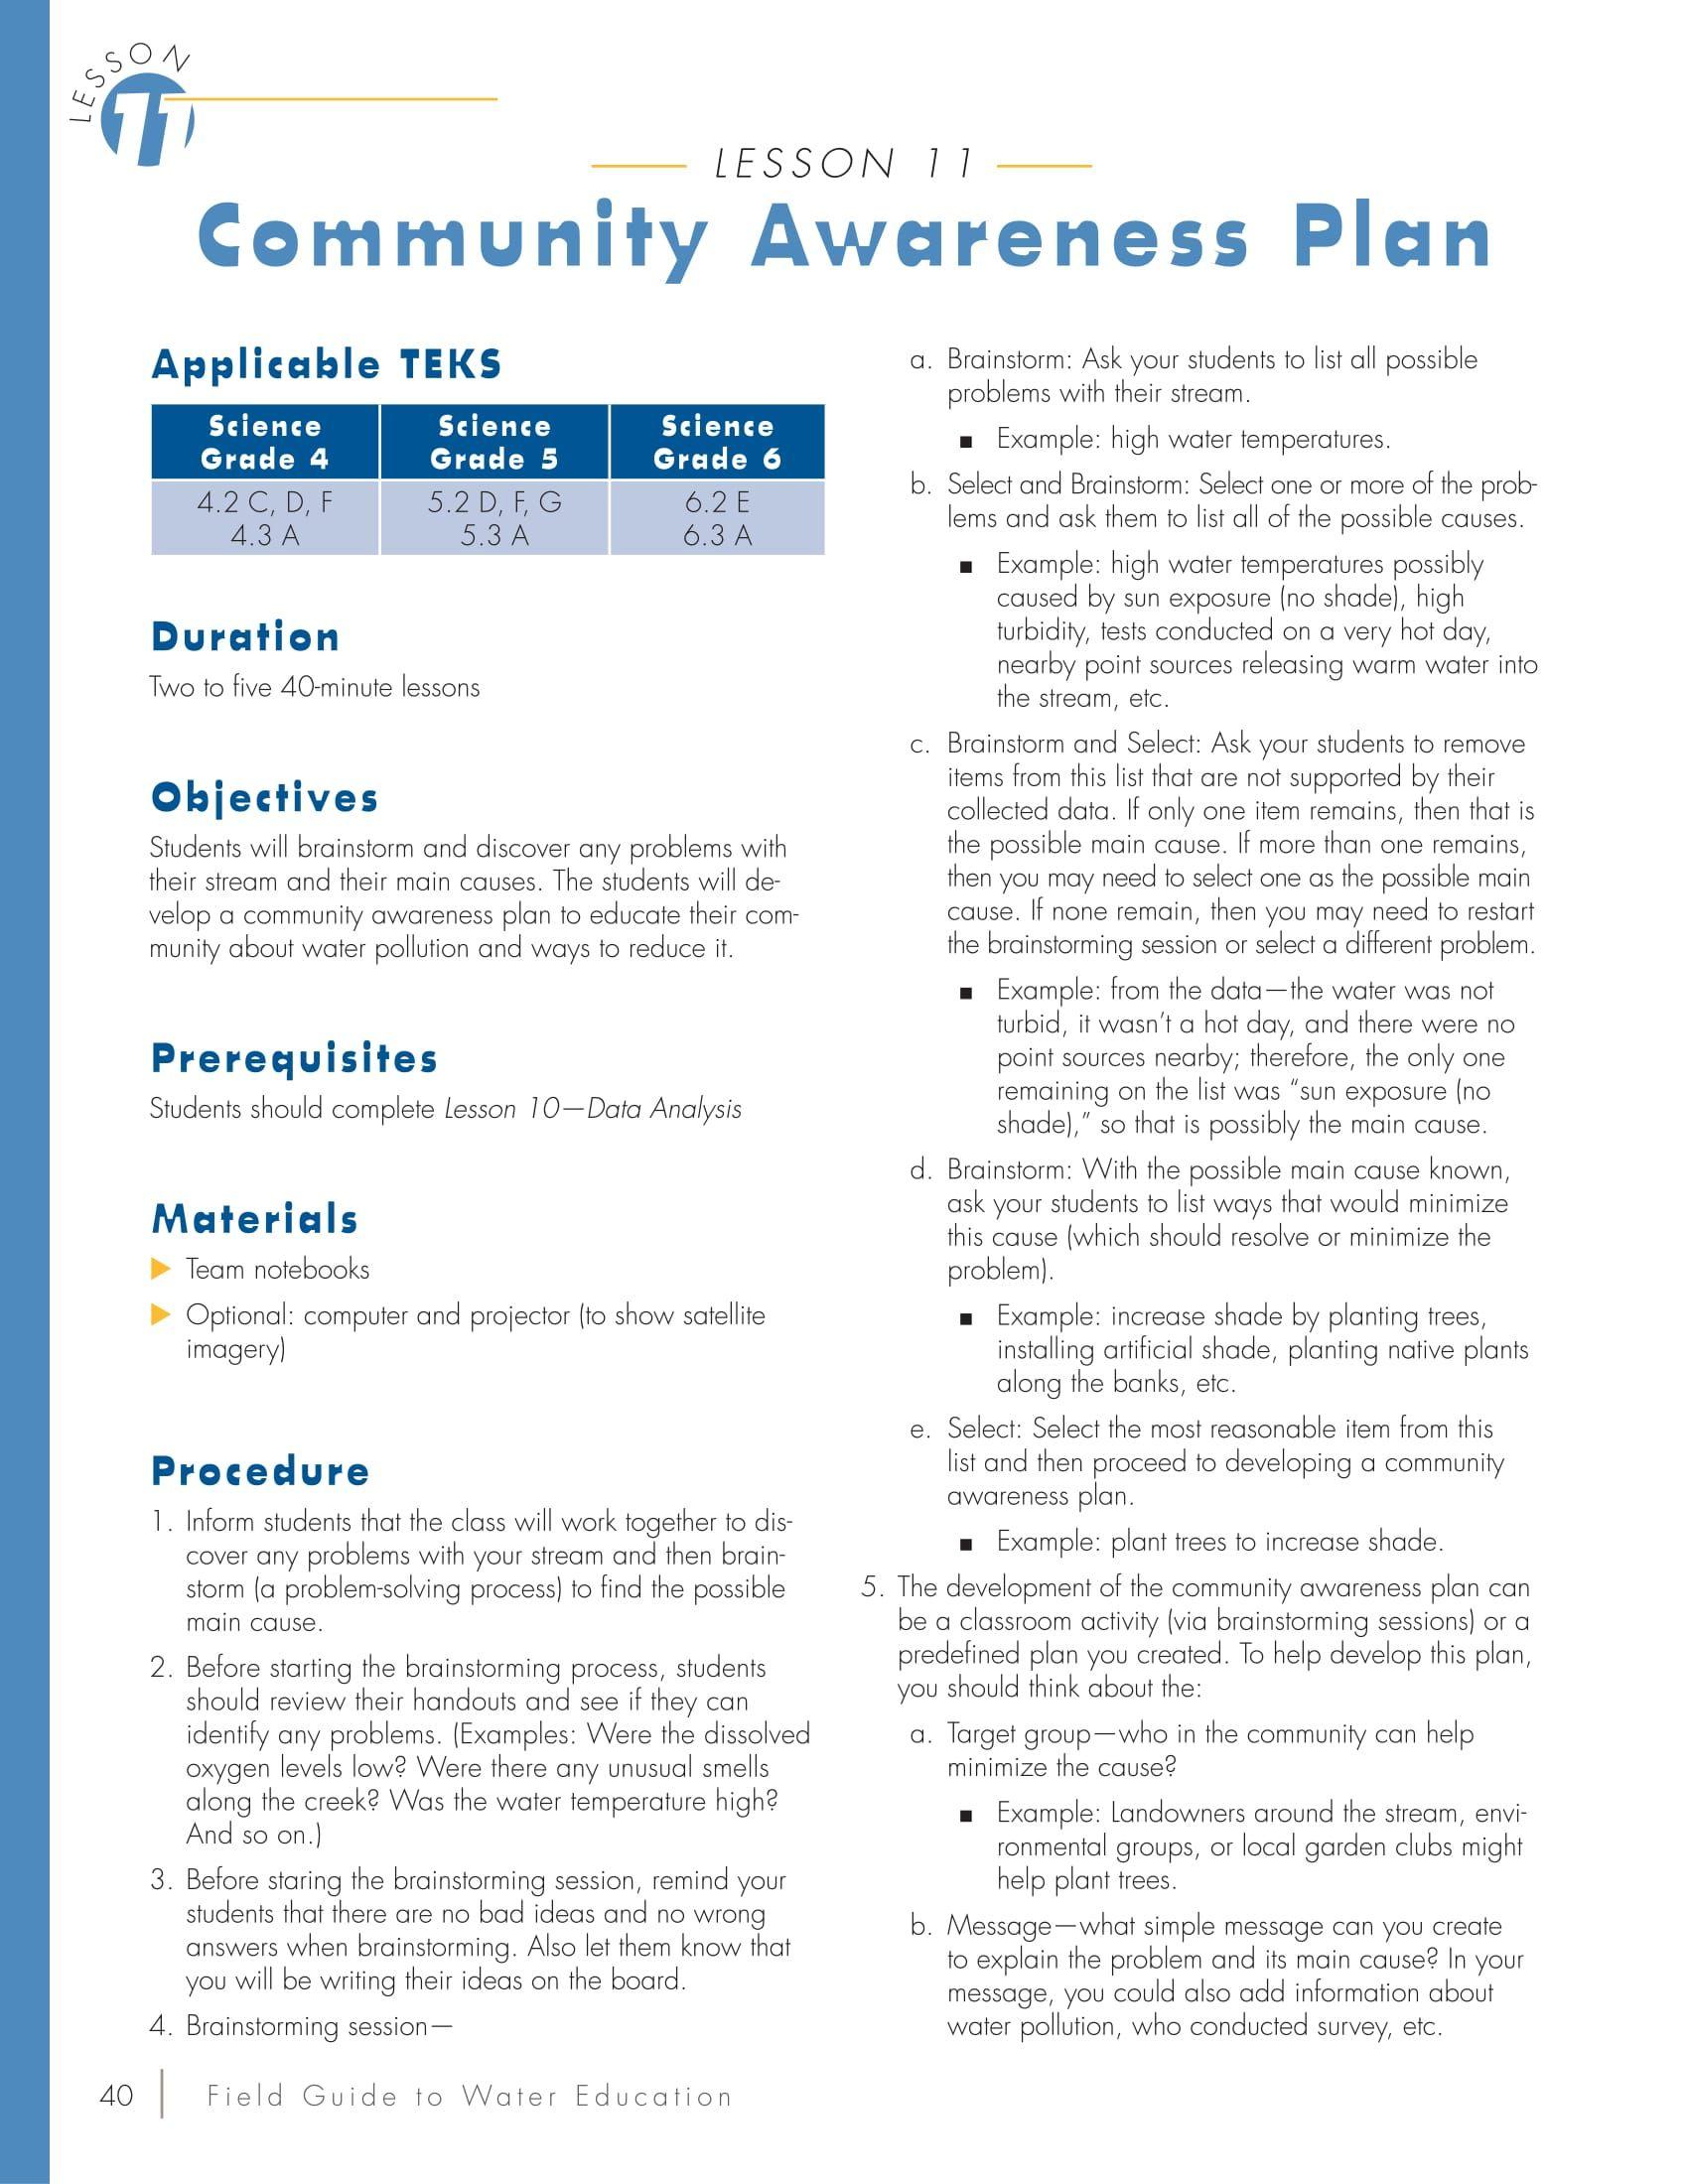 Community Awareness Plan Lesson Plan